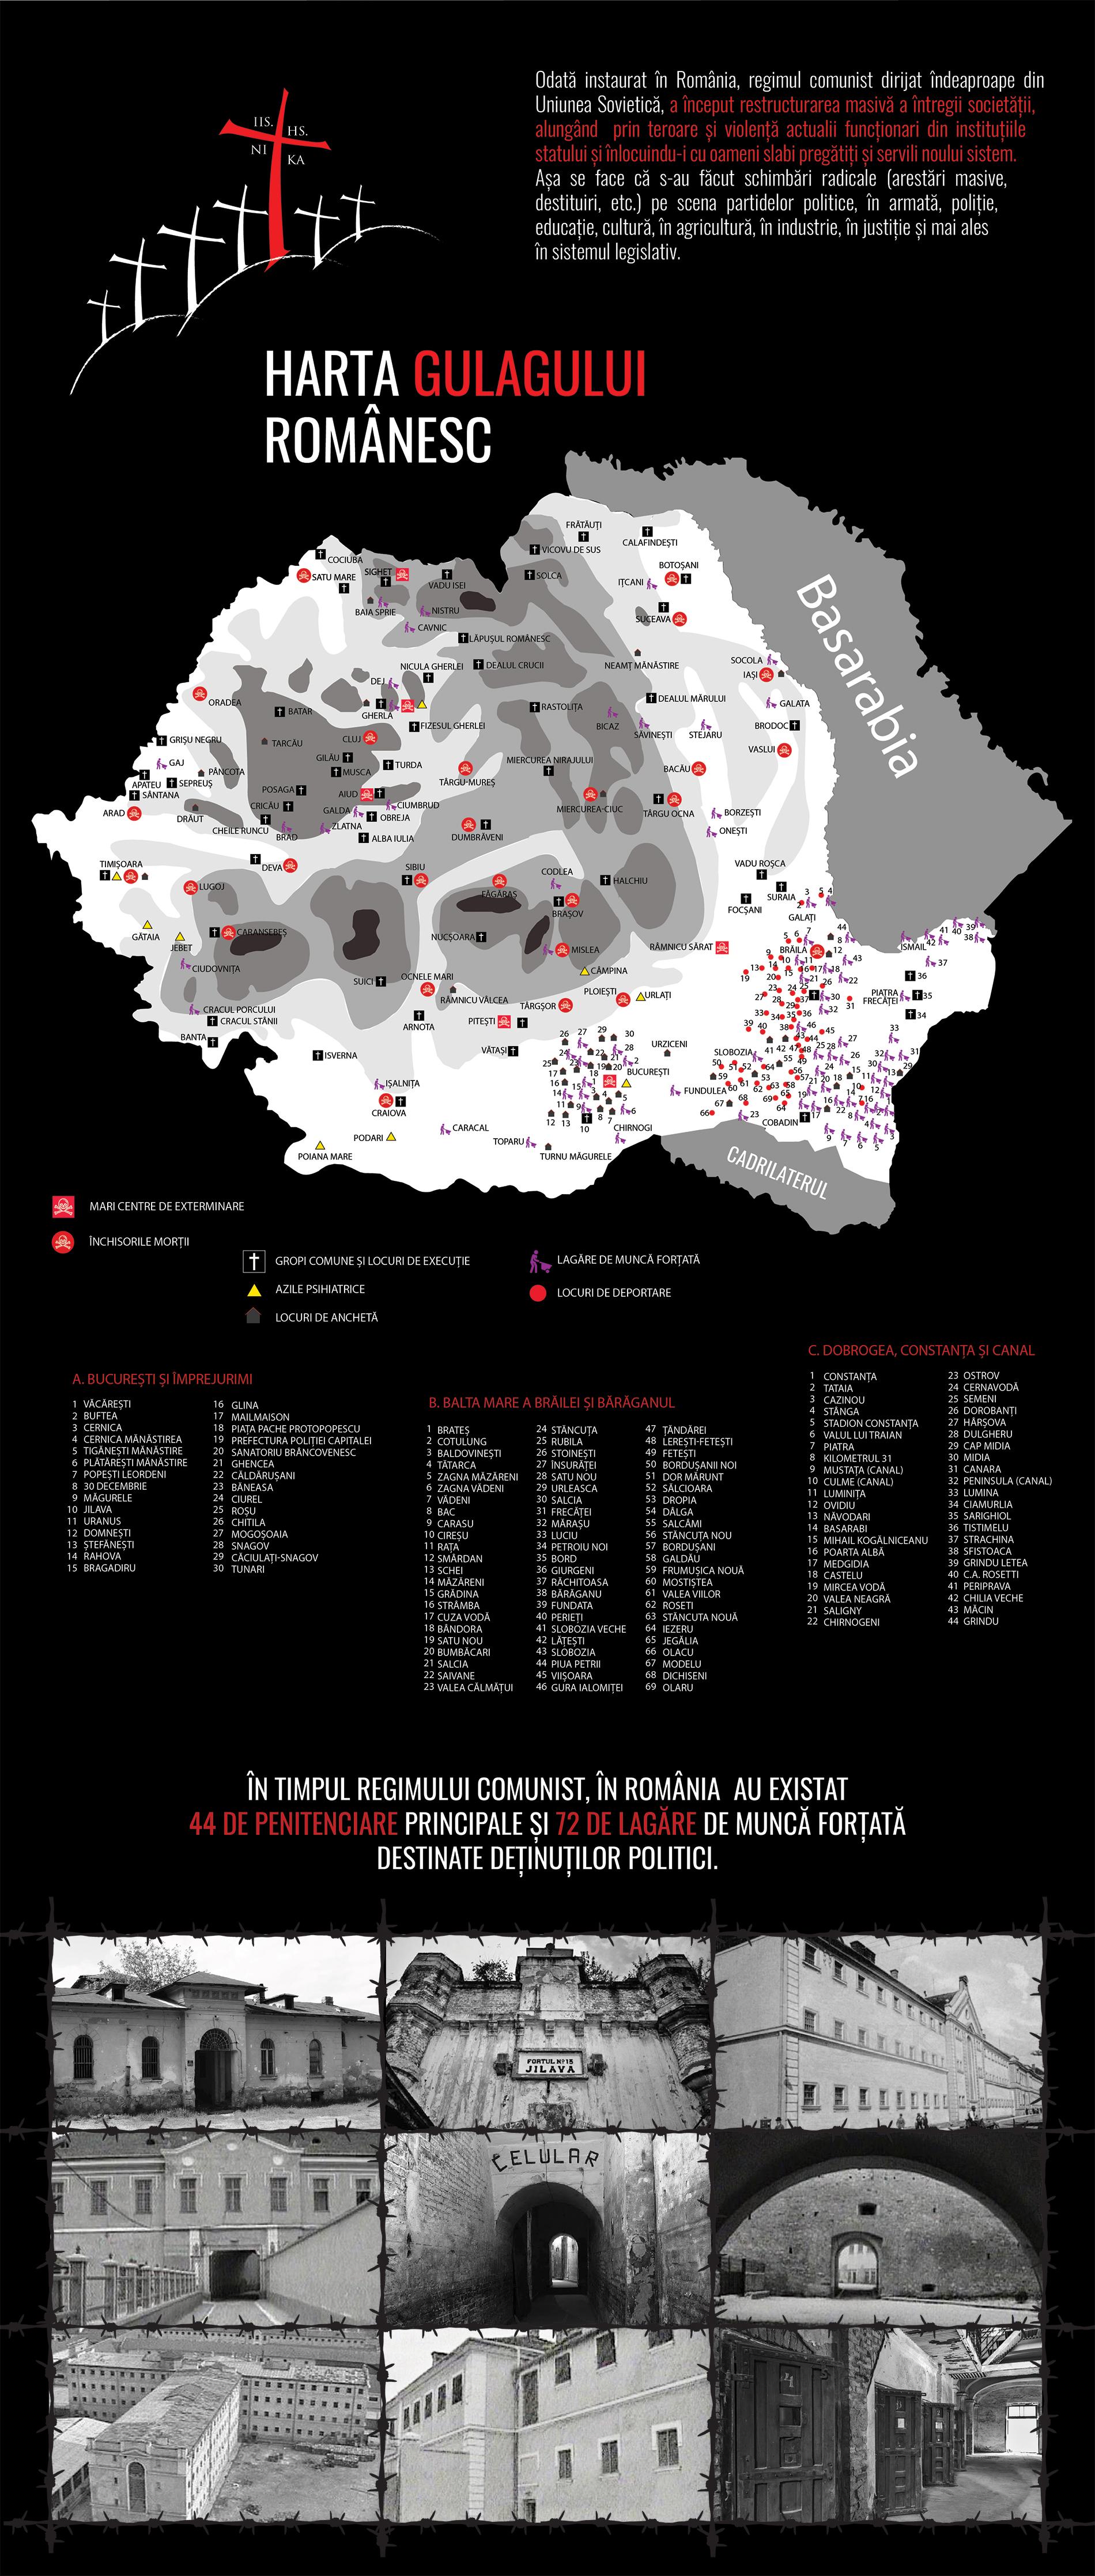 Harta Gulagului Românesc - Bannerul 06 - Caravana Eroilor